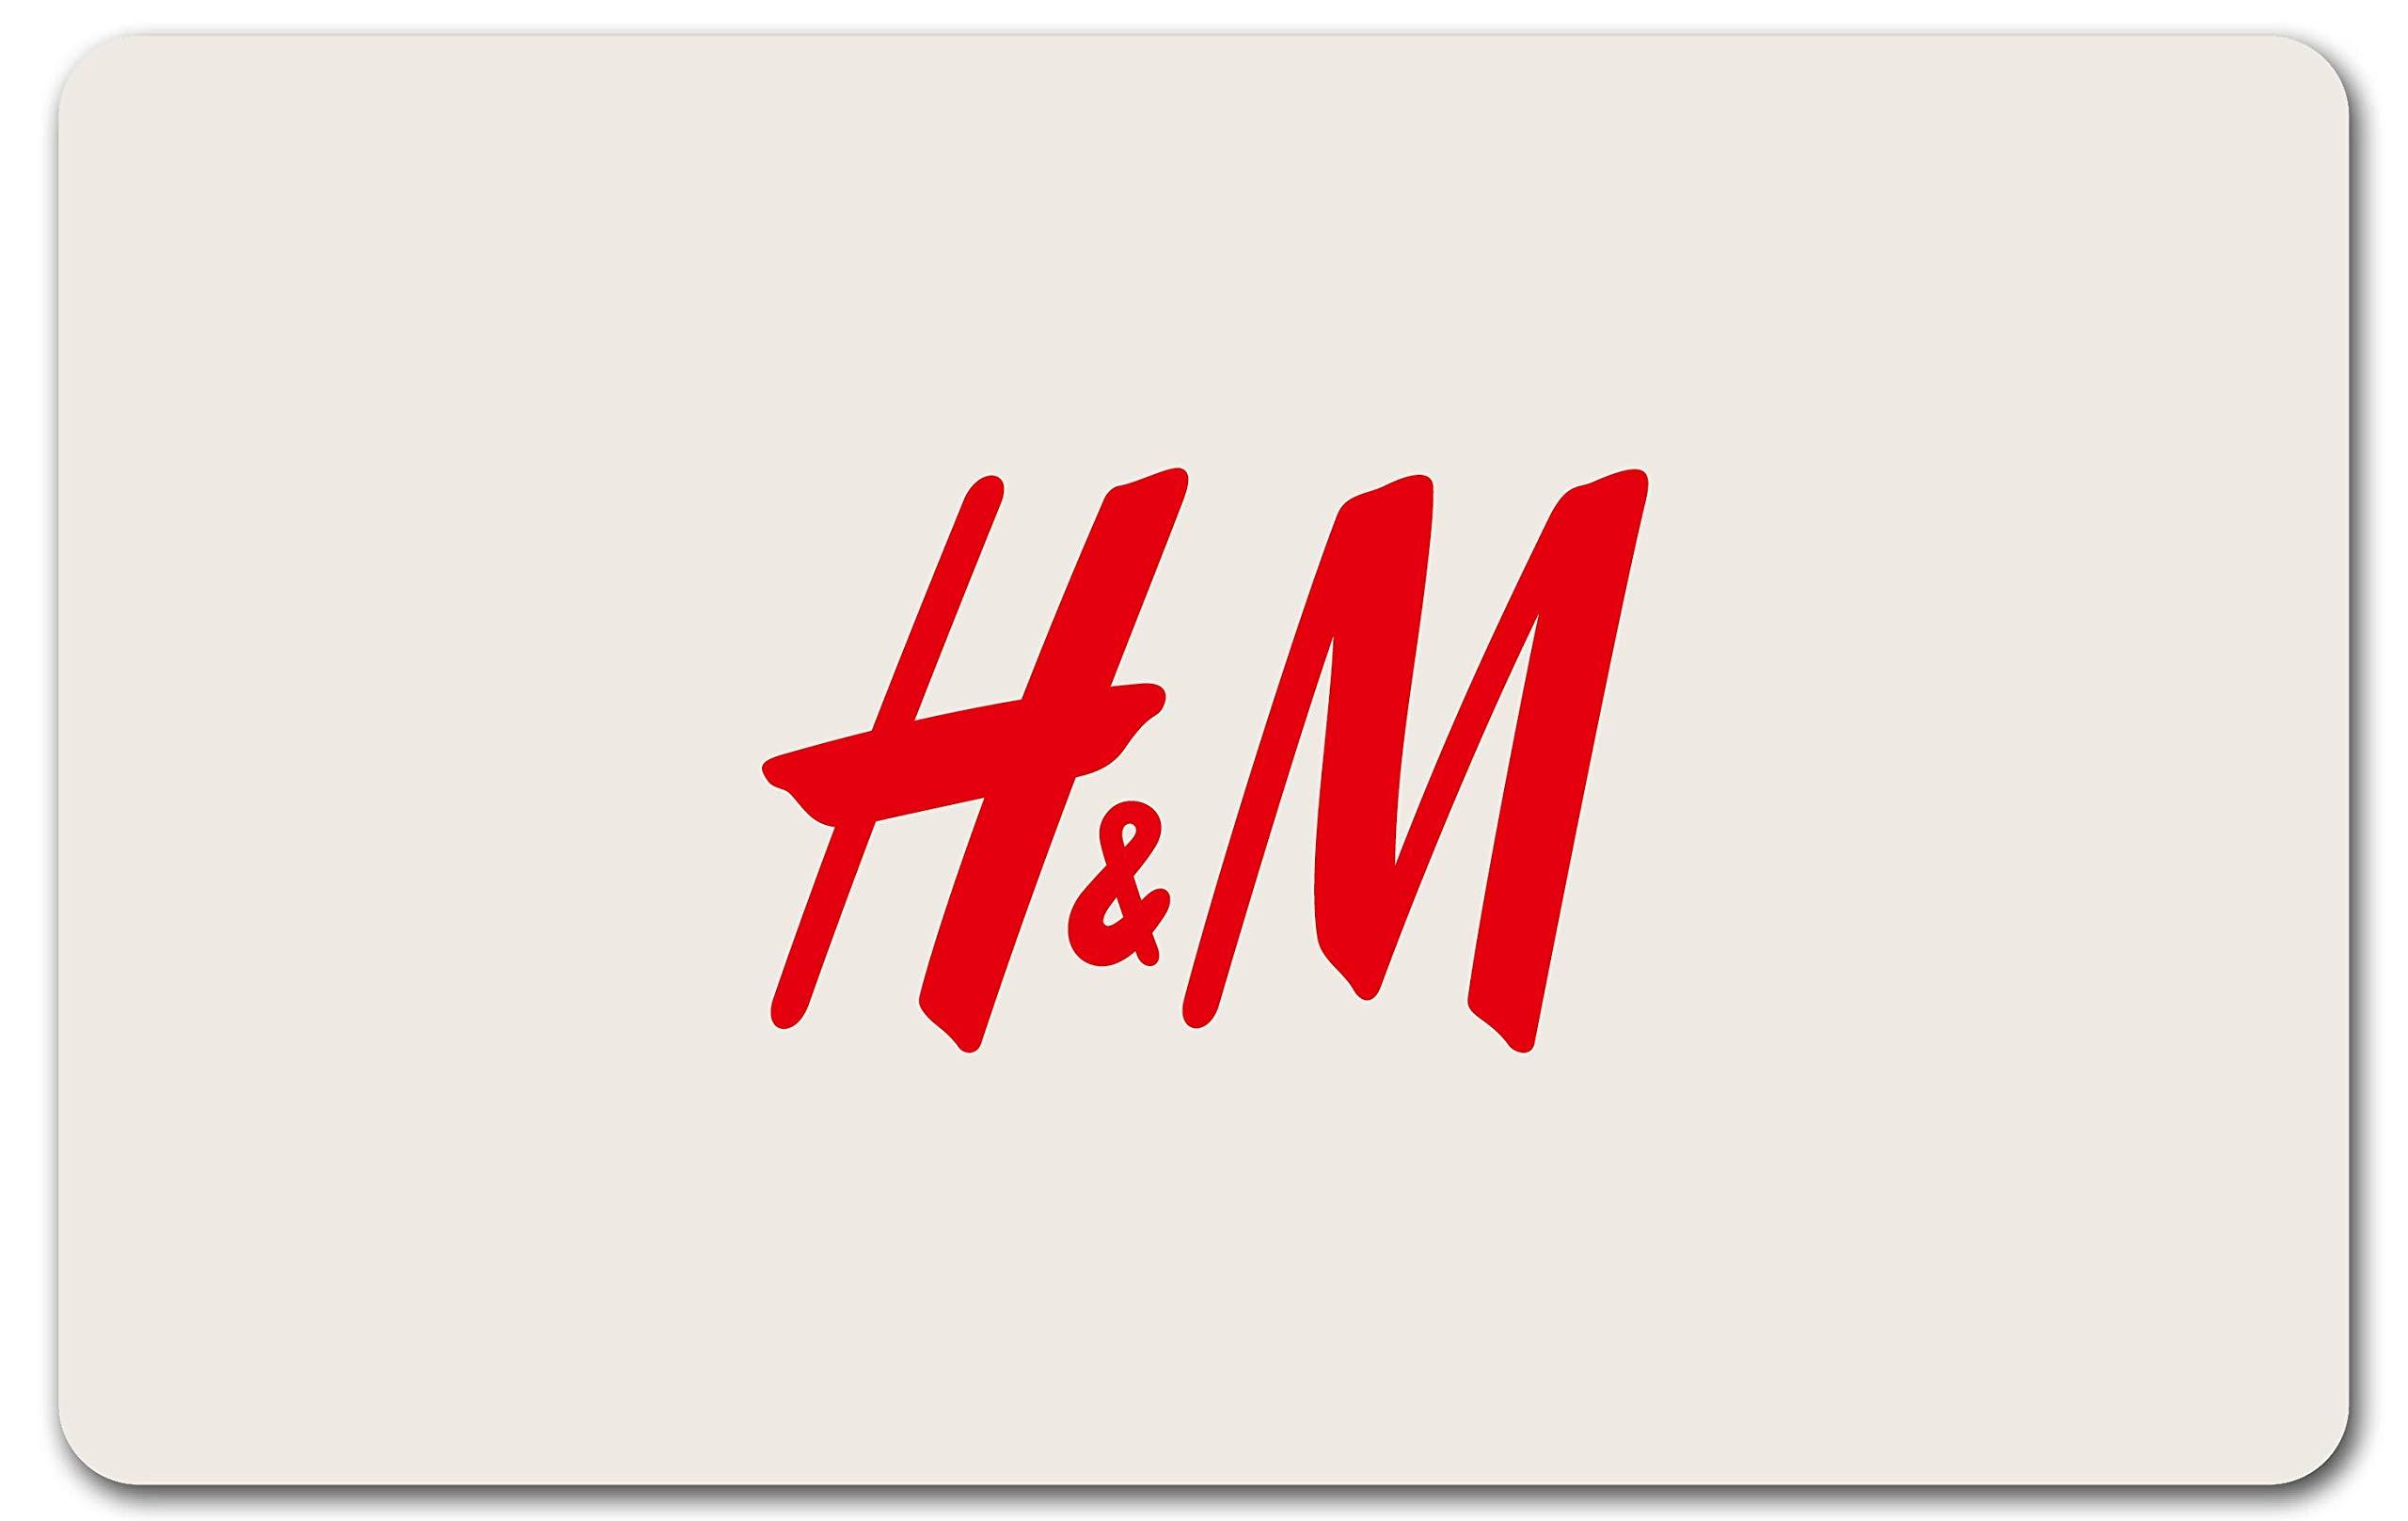 H&M Gift Card image link